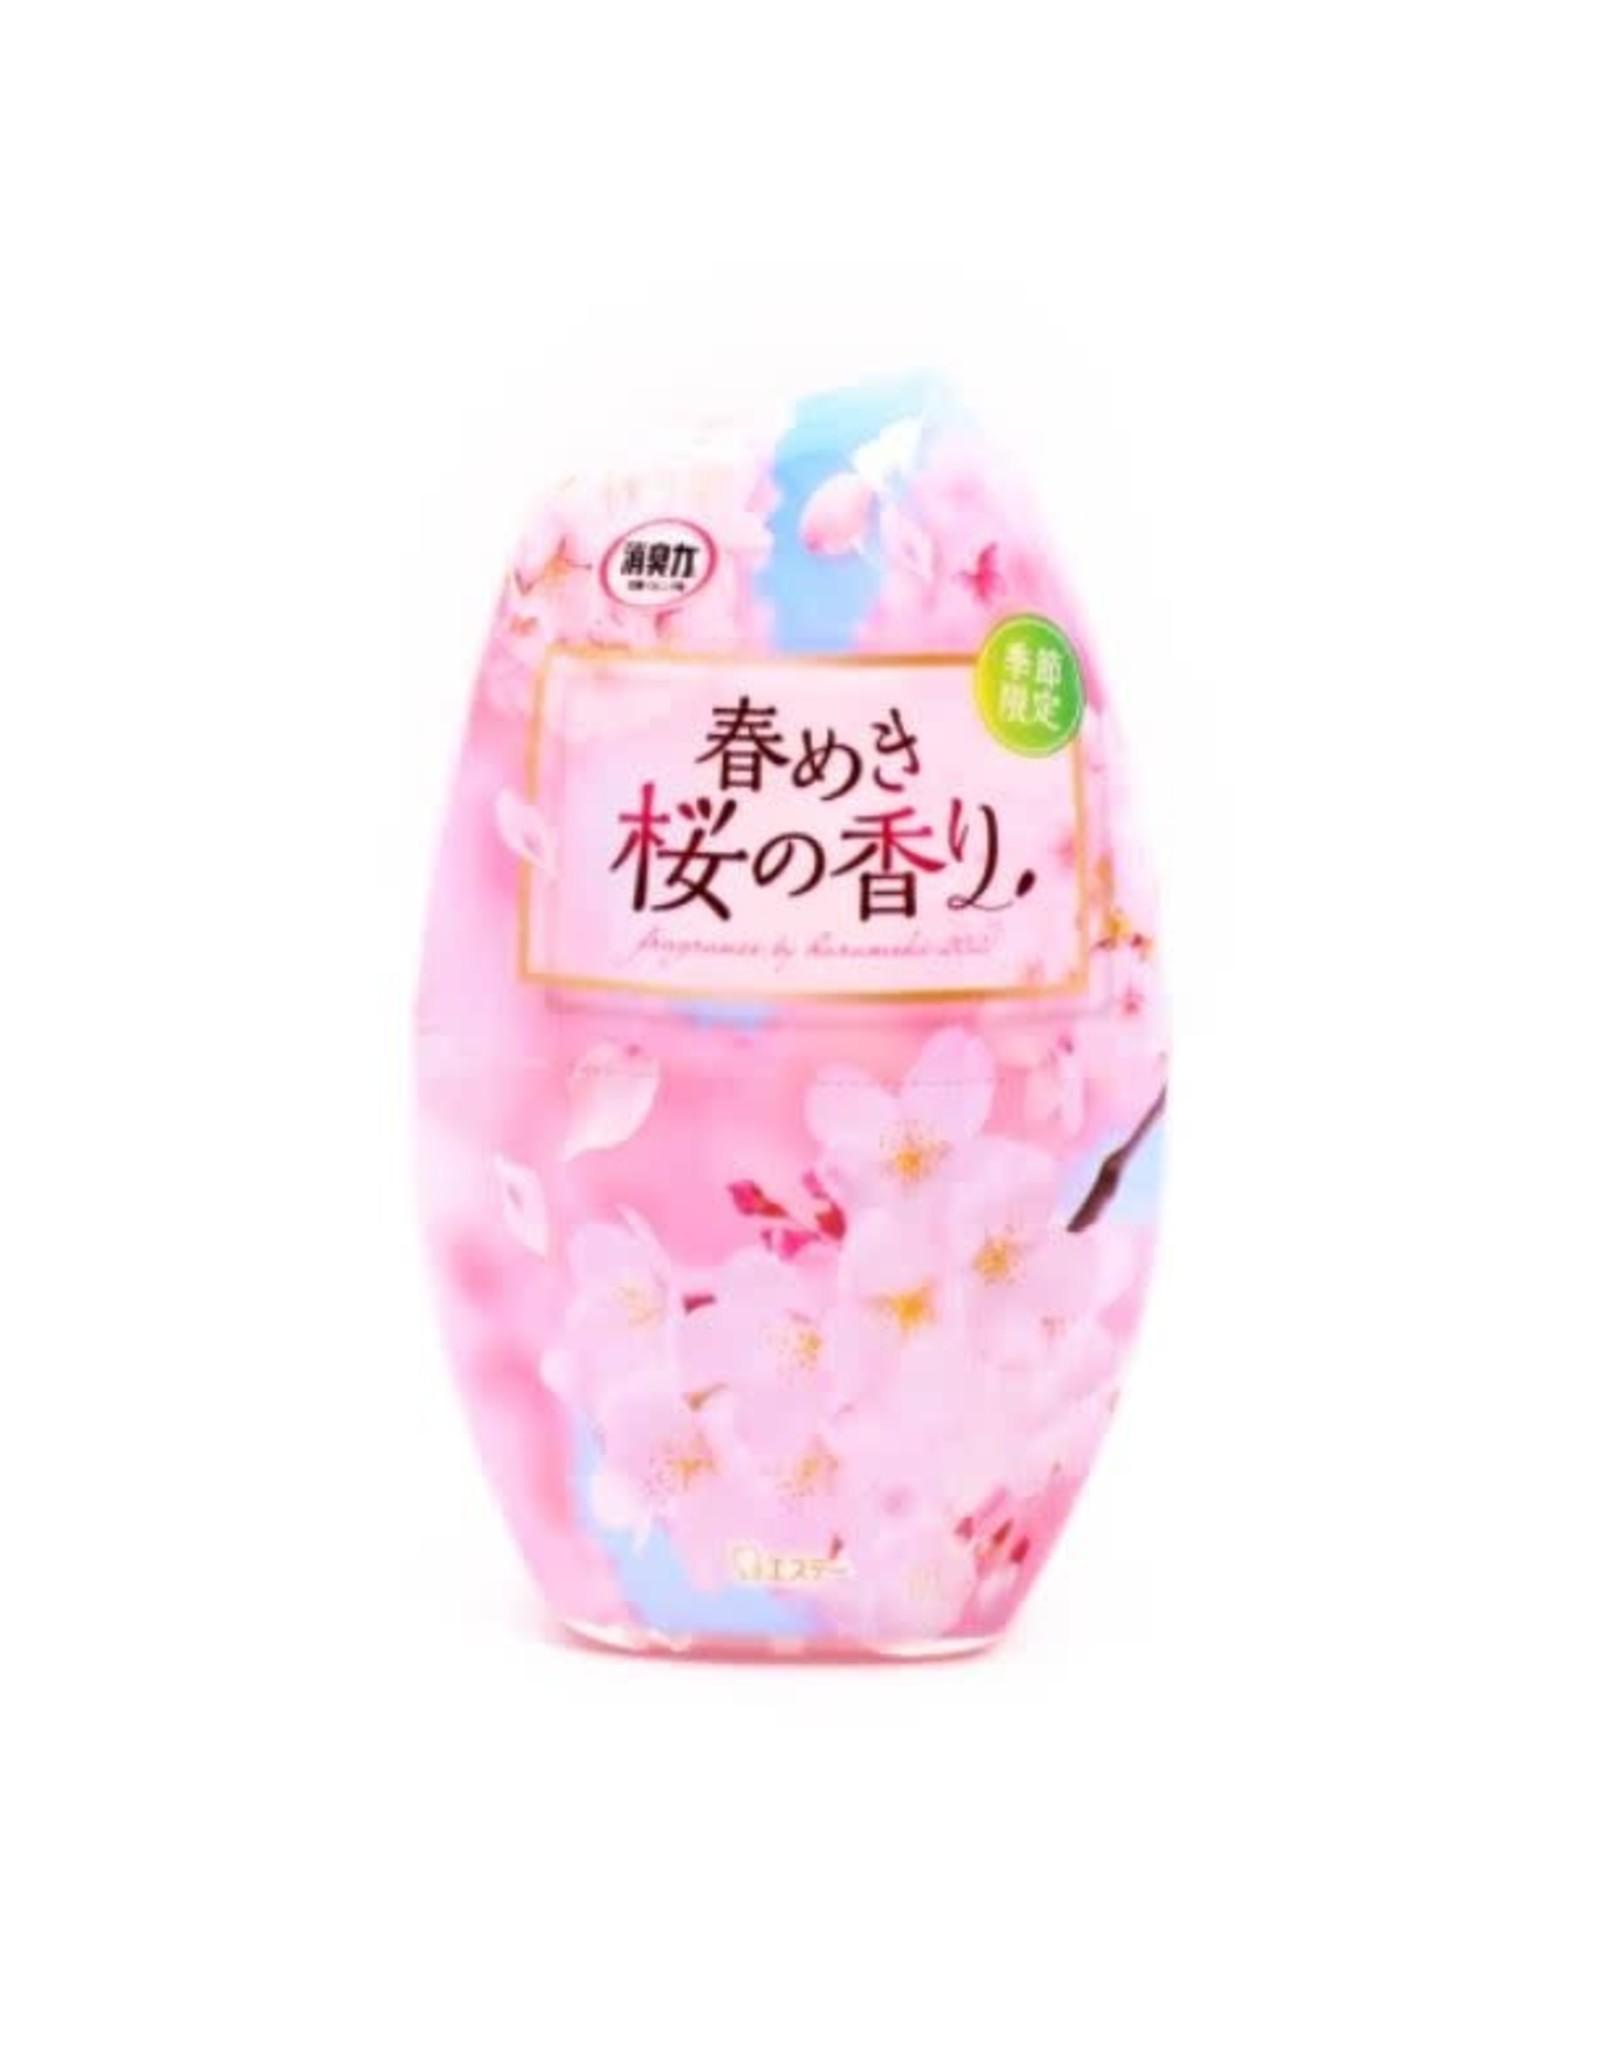 Shoshu-Riki Deodorizer For Entrance & Living Room - Sakura